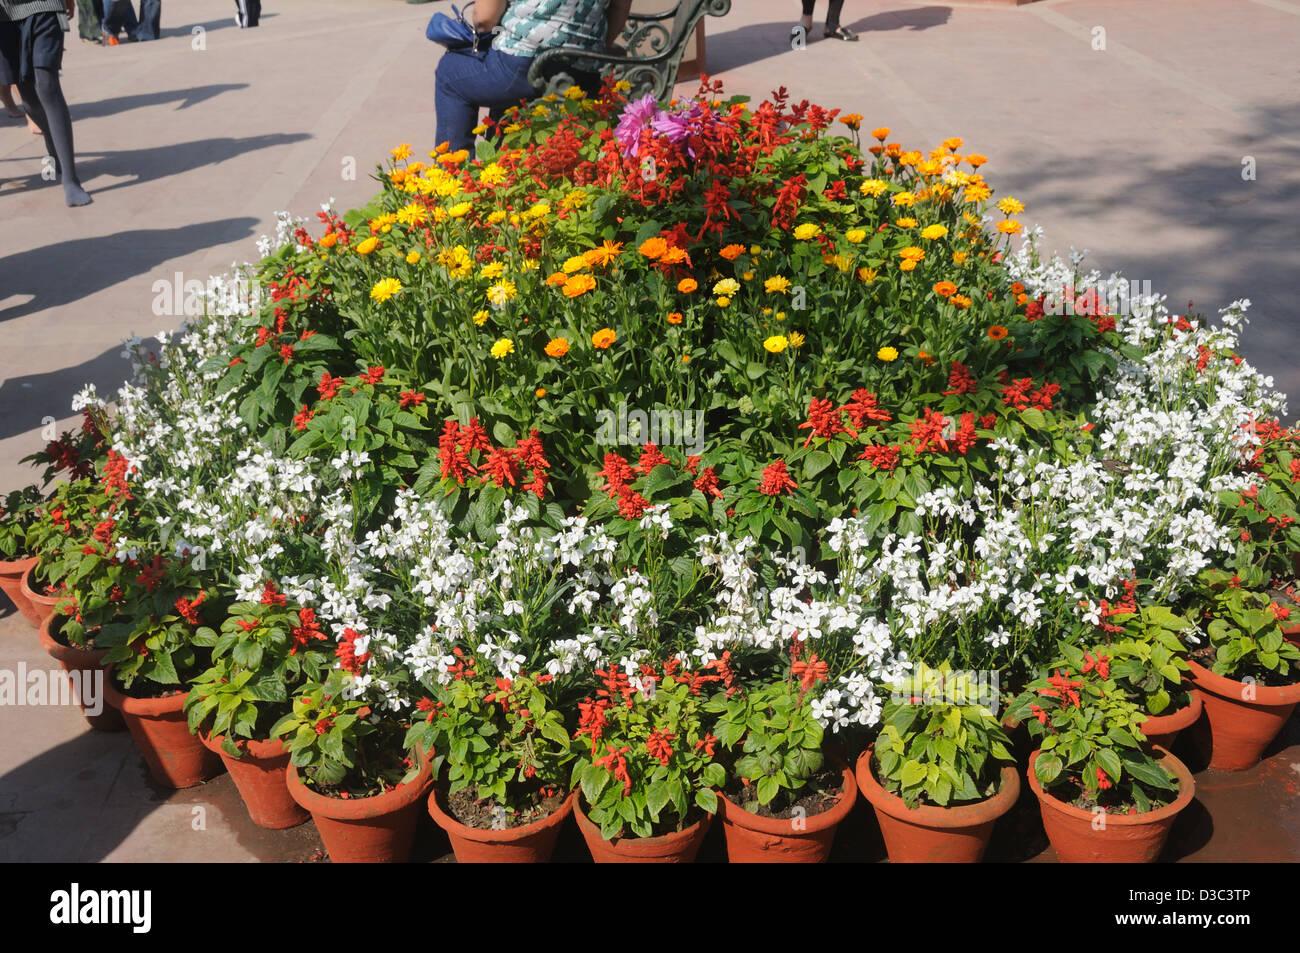 Pots de fleurs à Delhi, Inde Photo Stock